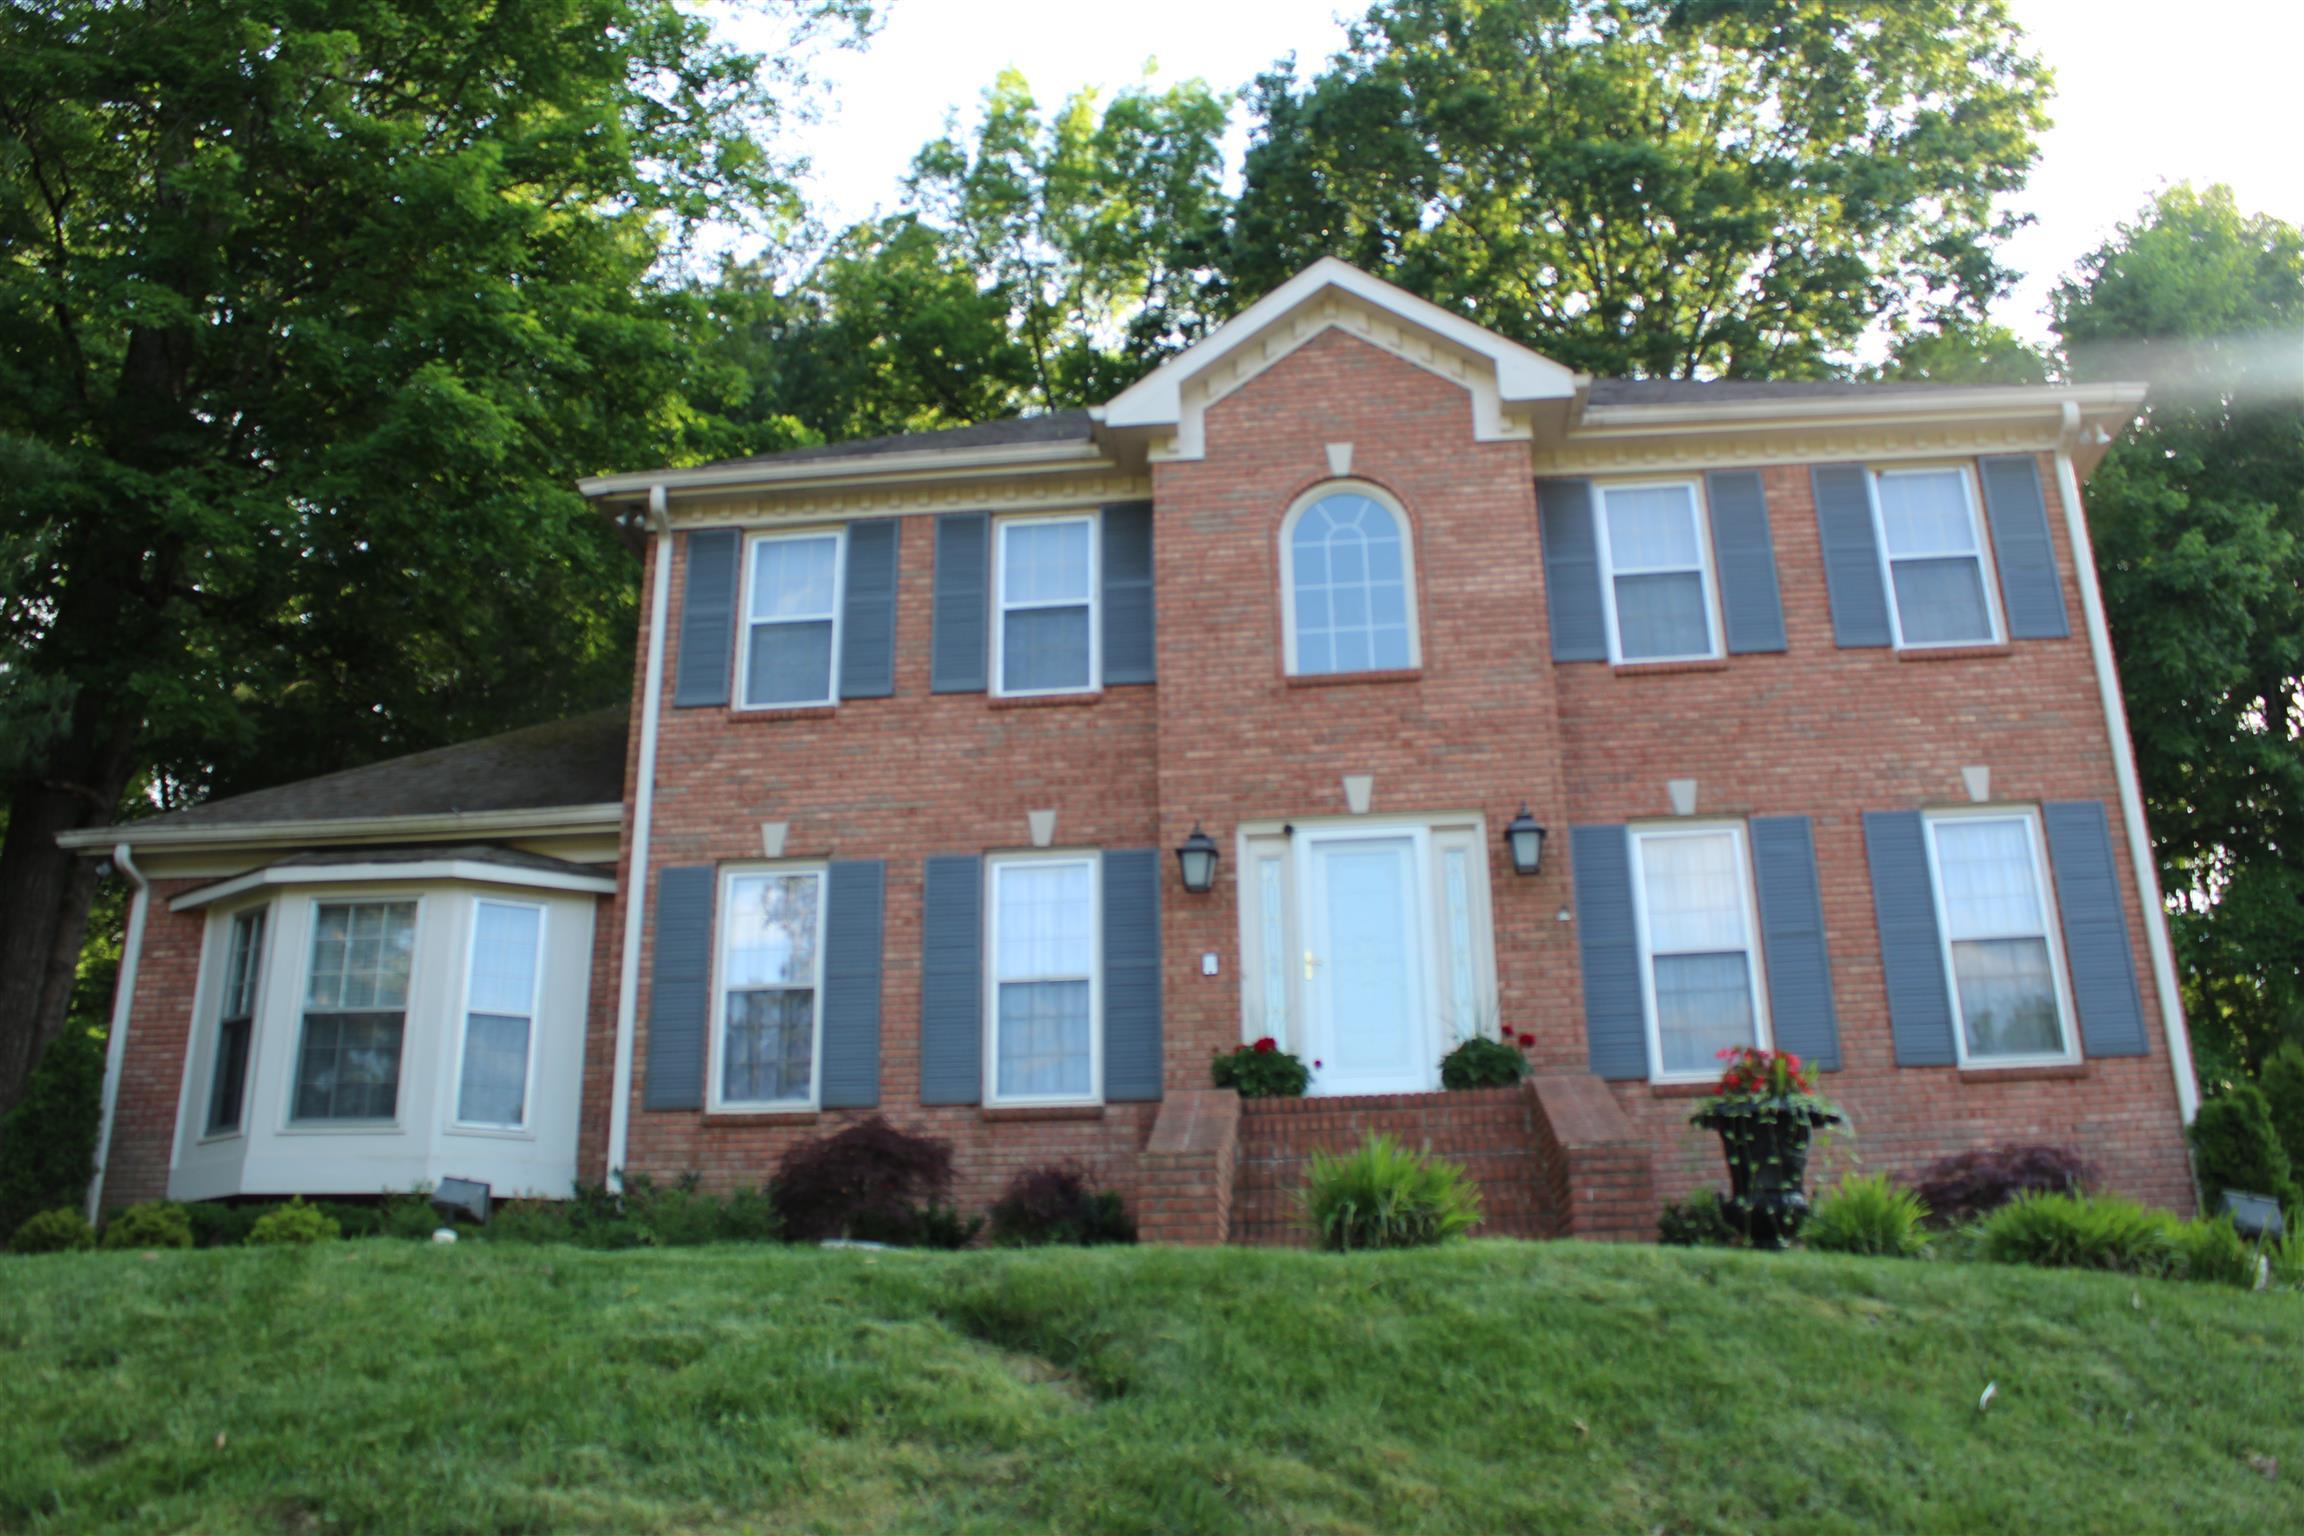 2800 Wimbledon Ct, Clarksville, TN 37043 - Clarksville, TN real estate listing